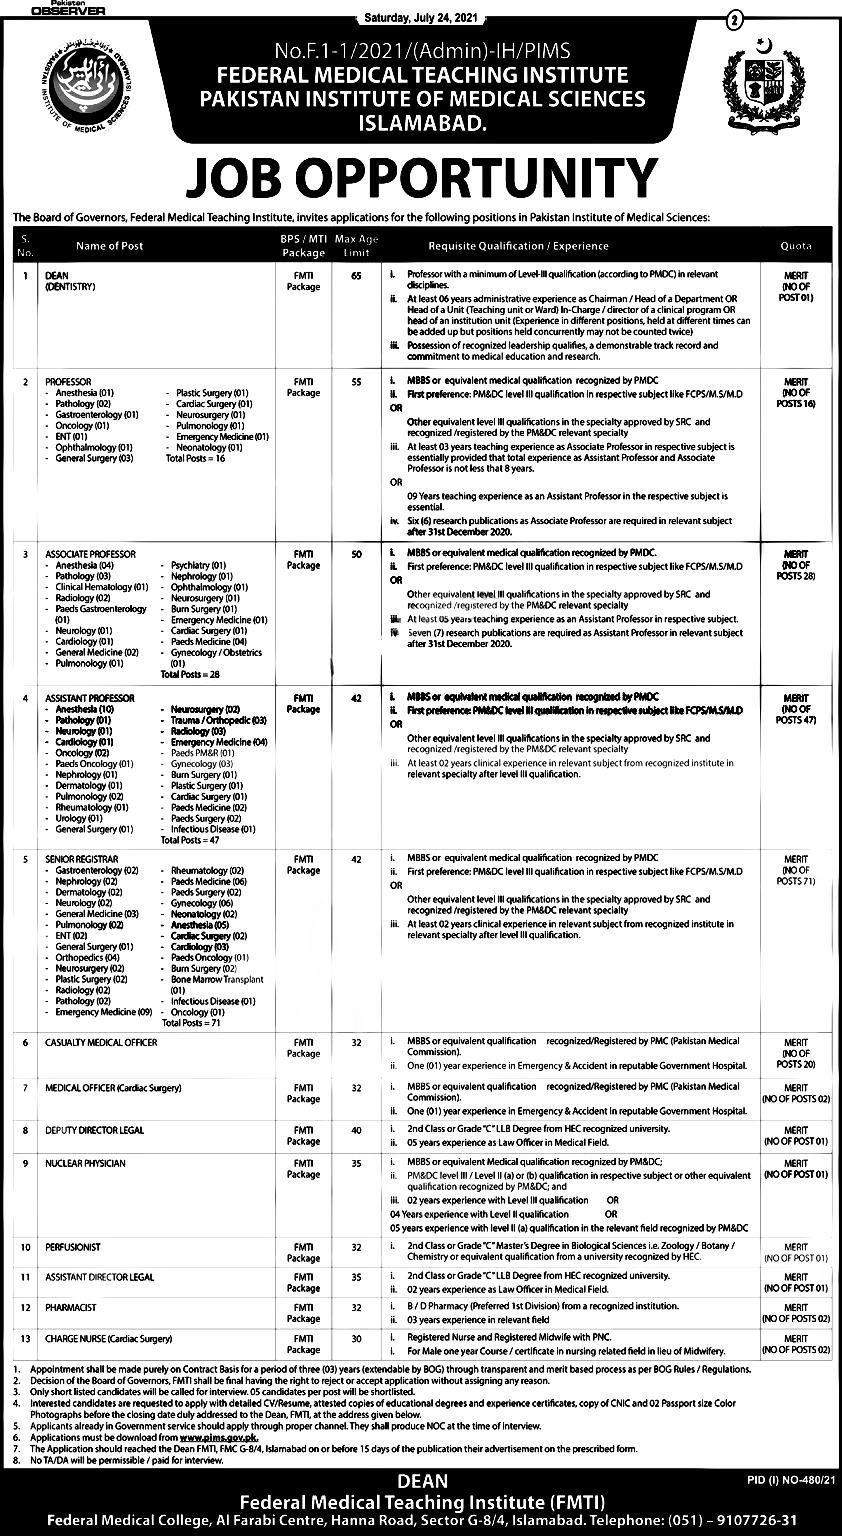 Pakistan Institute of Medical Sciences PIMS Islamabad Jobs 2021